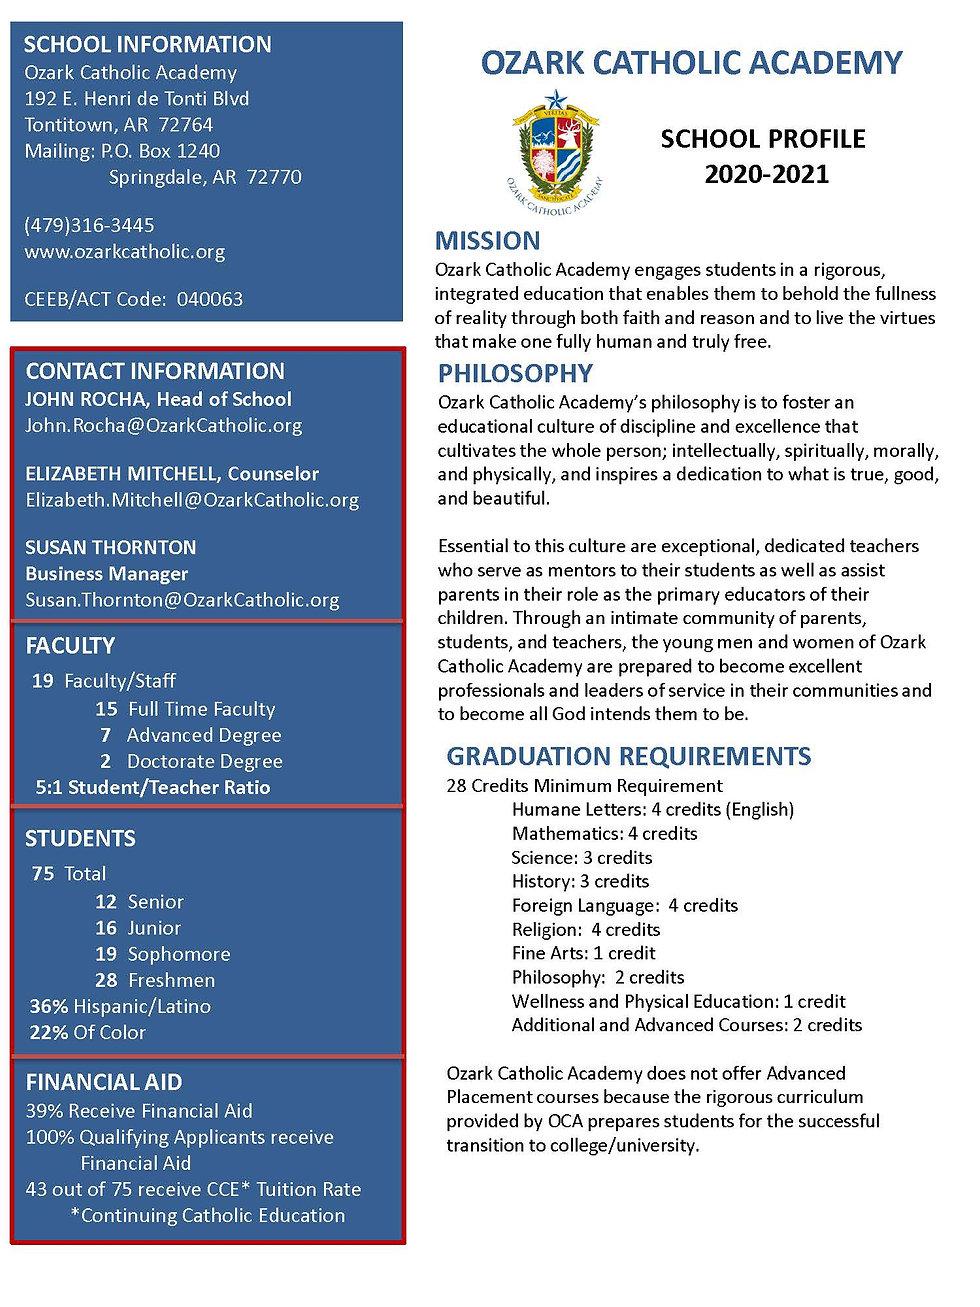 School Profile 2020_21_Page_1.jpg